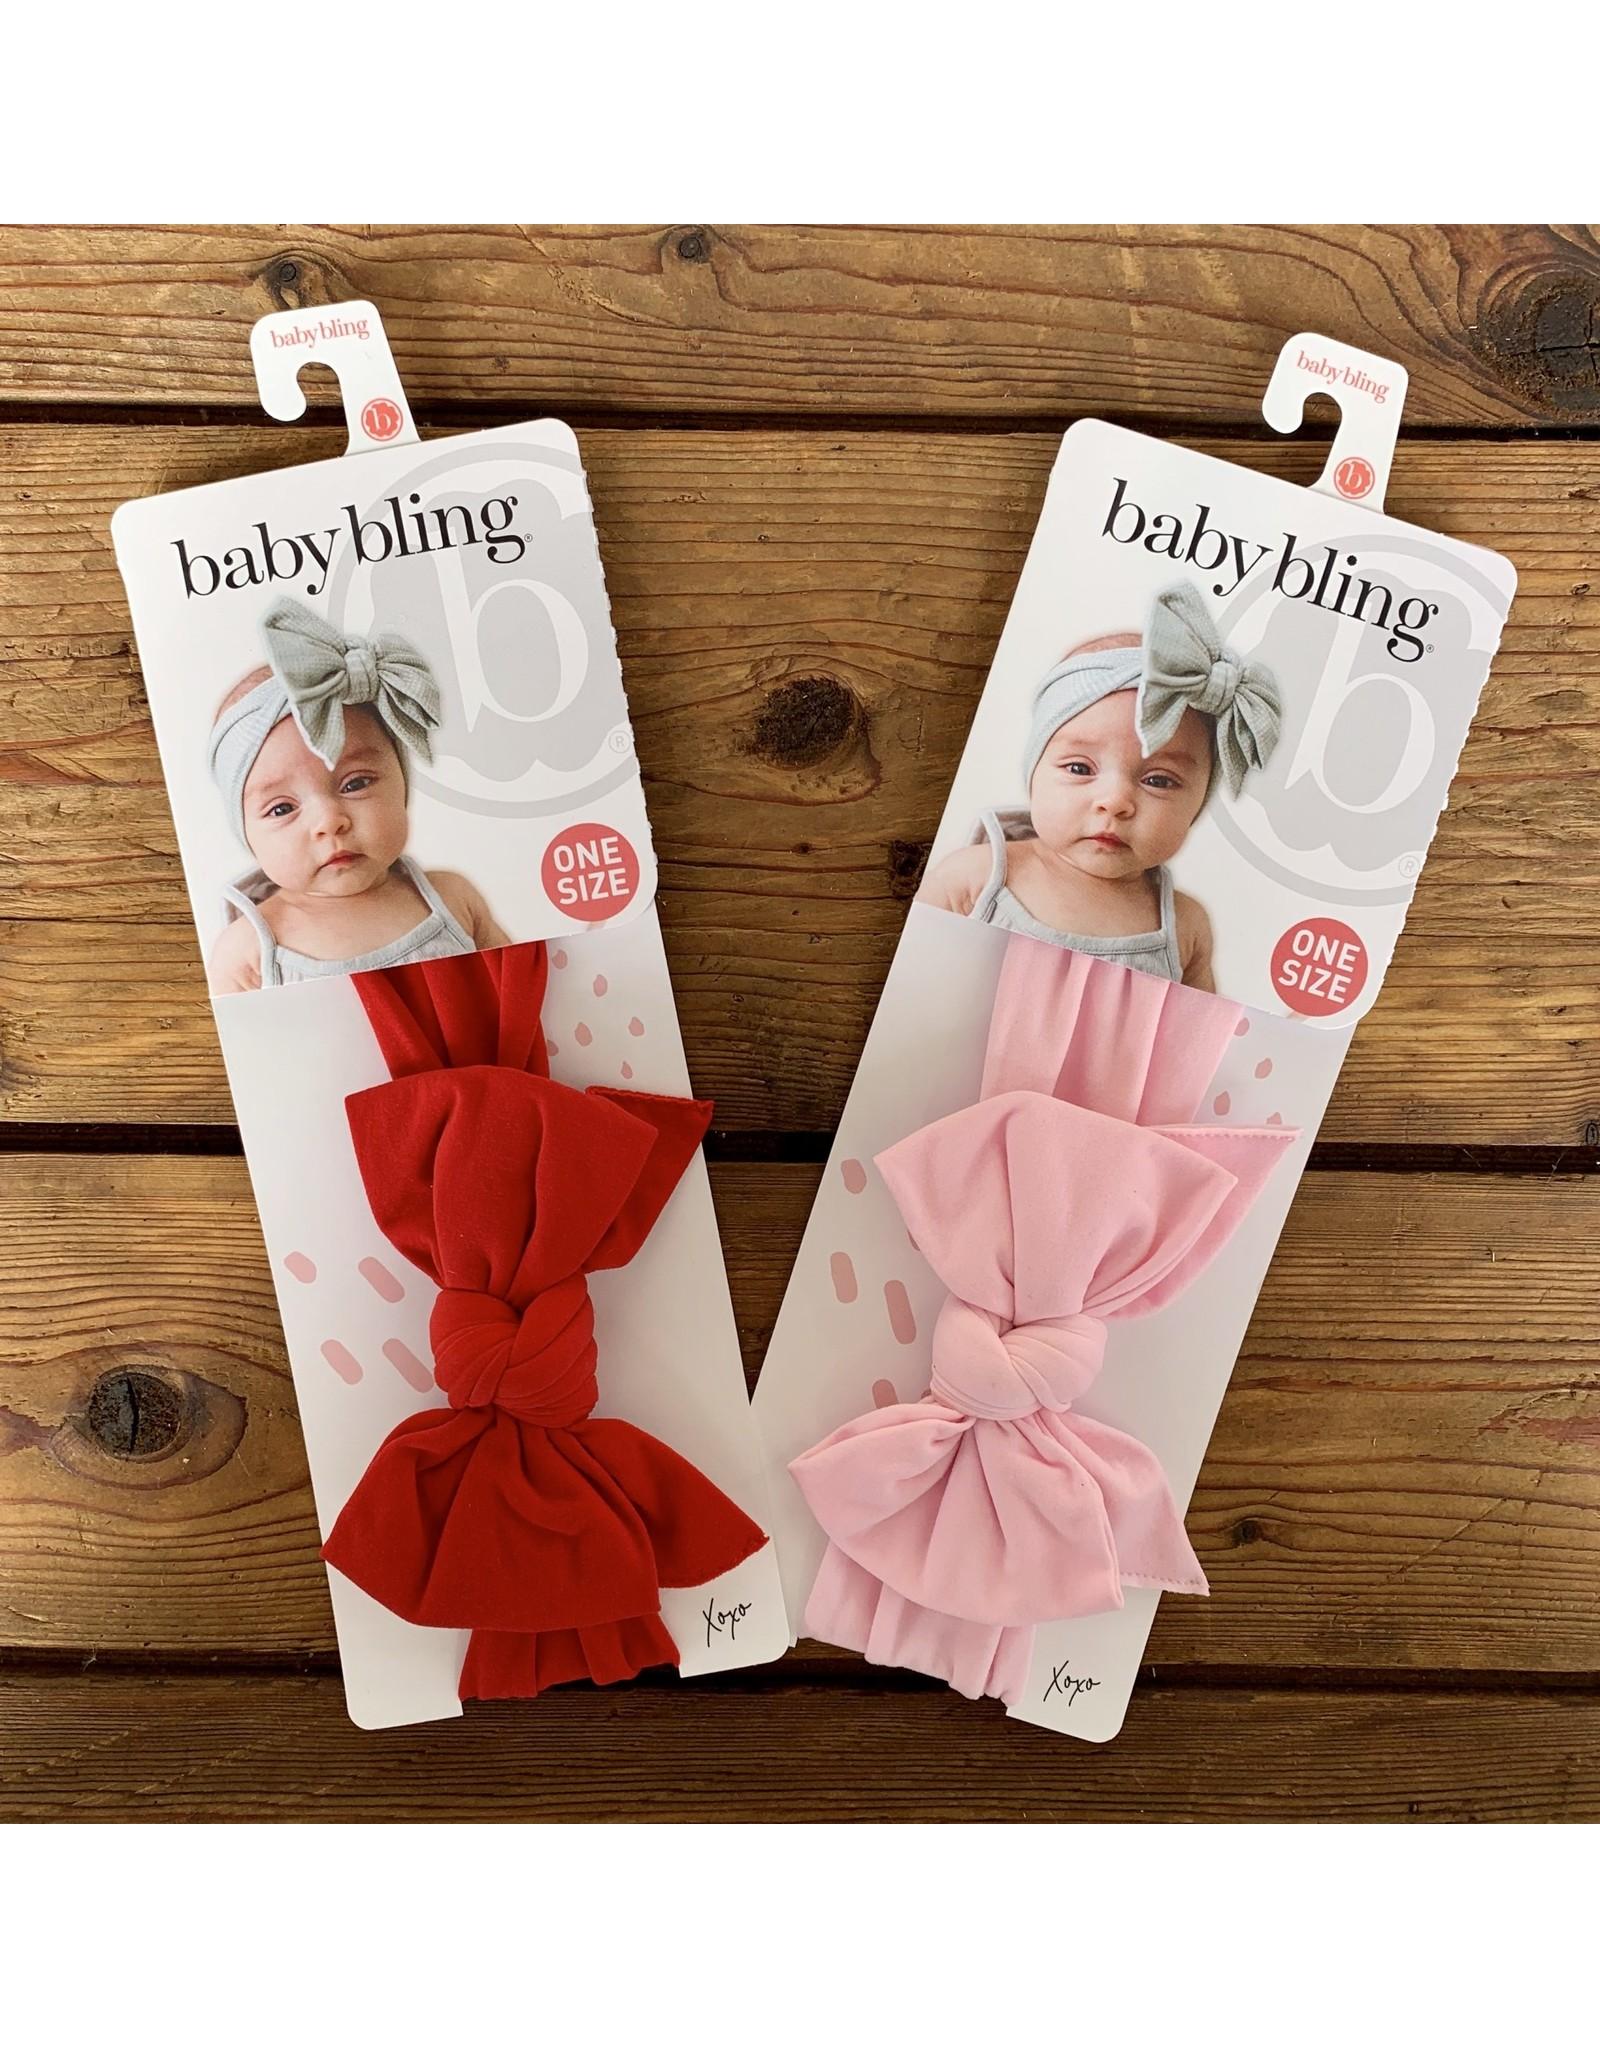 Baby Bling Baby Bling - Dang Enormous Bow Headband